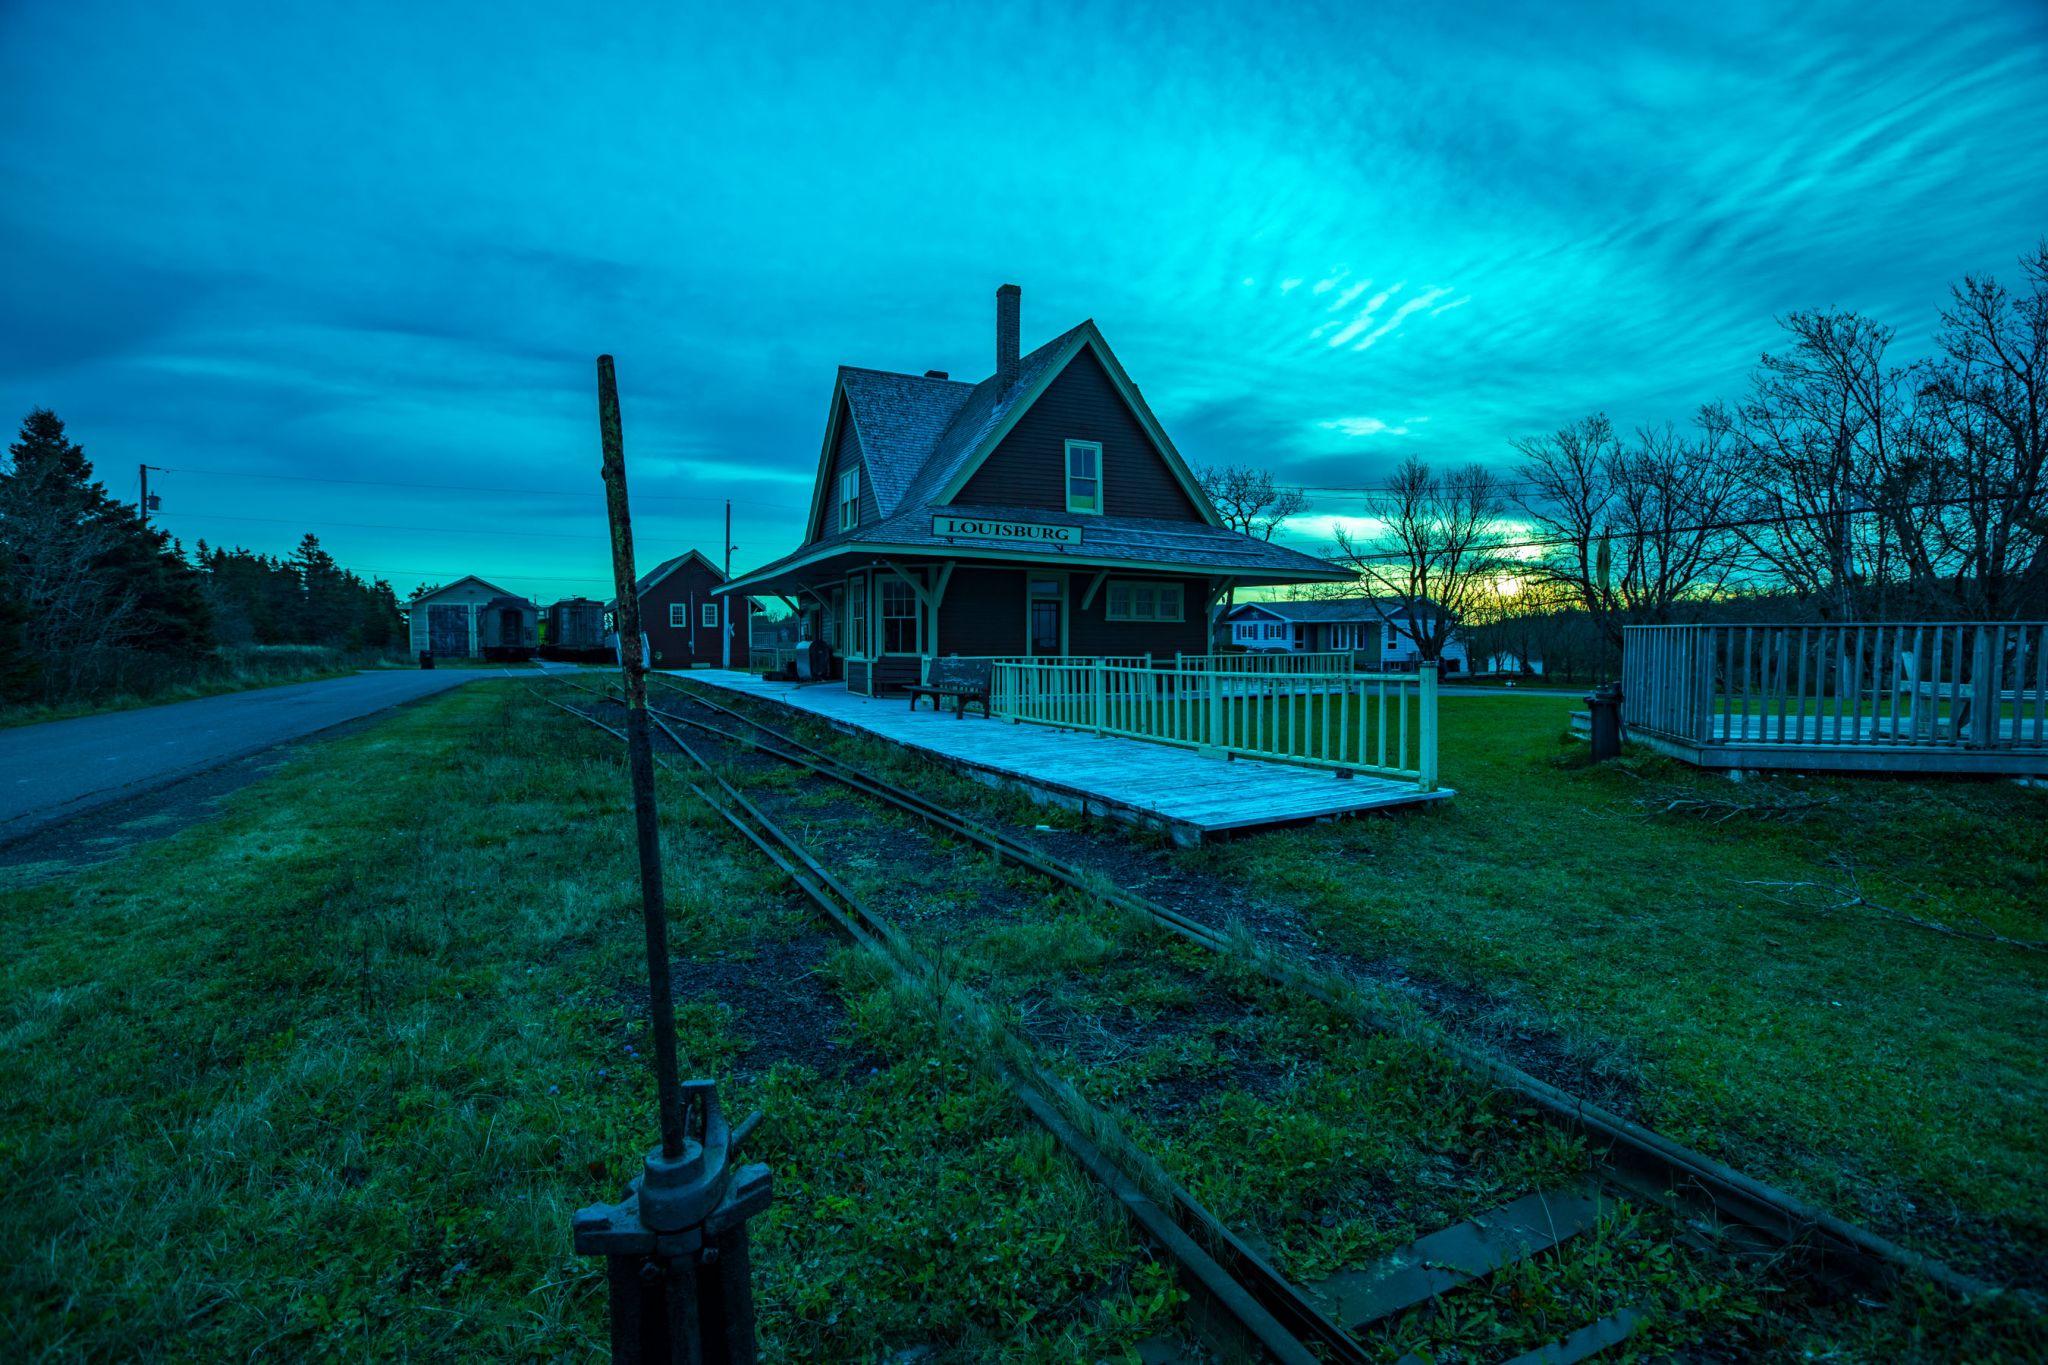 Louisbourg Station Museum sunrise Cape Brenton Nova Scotia, Canada